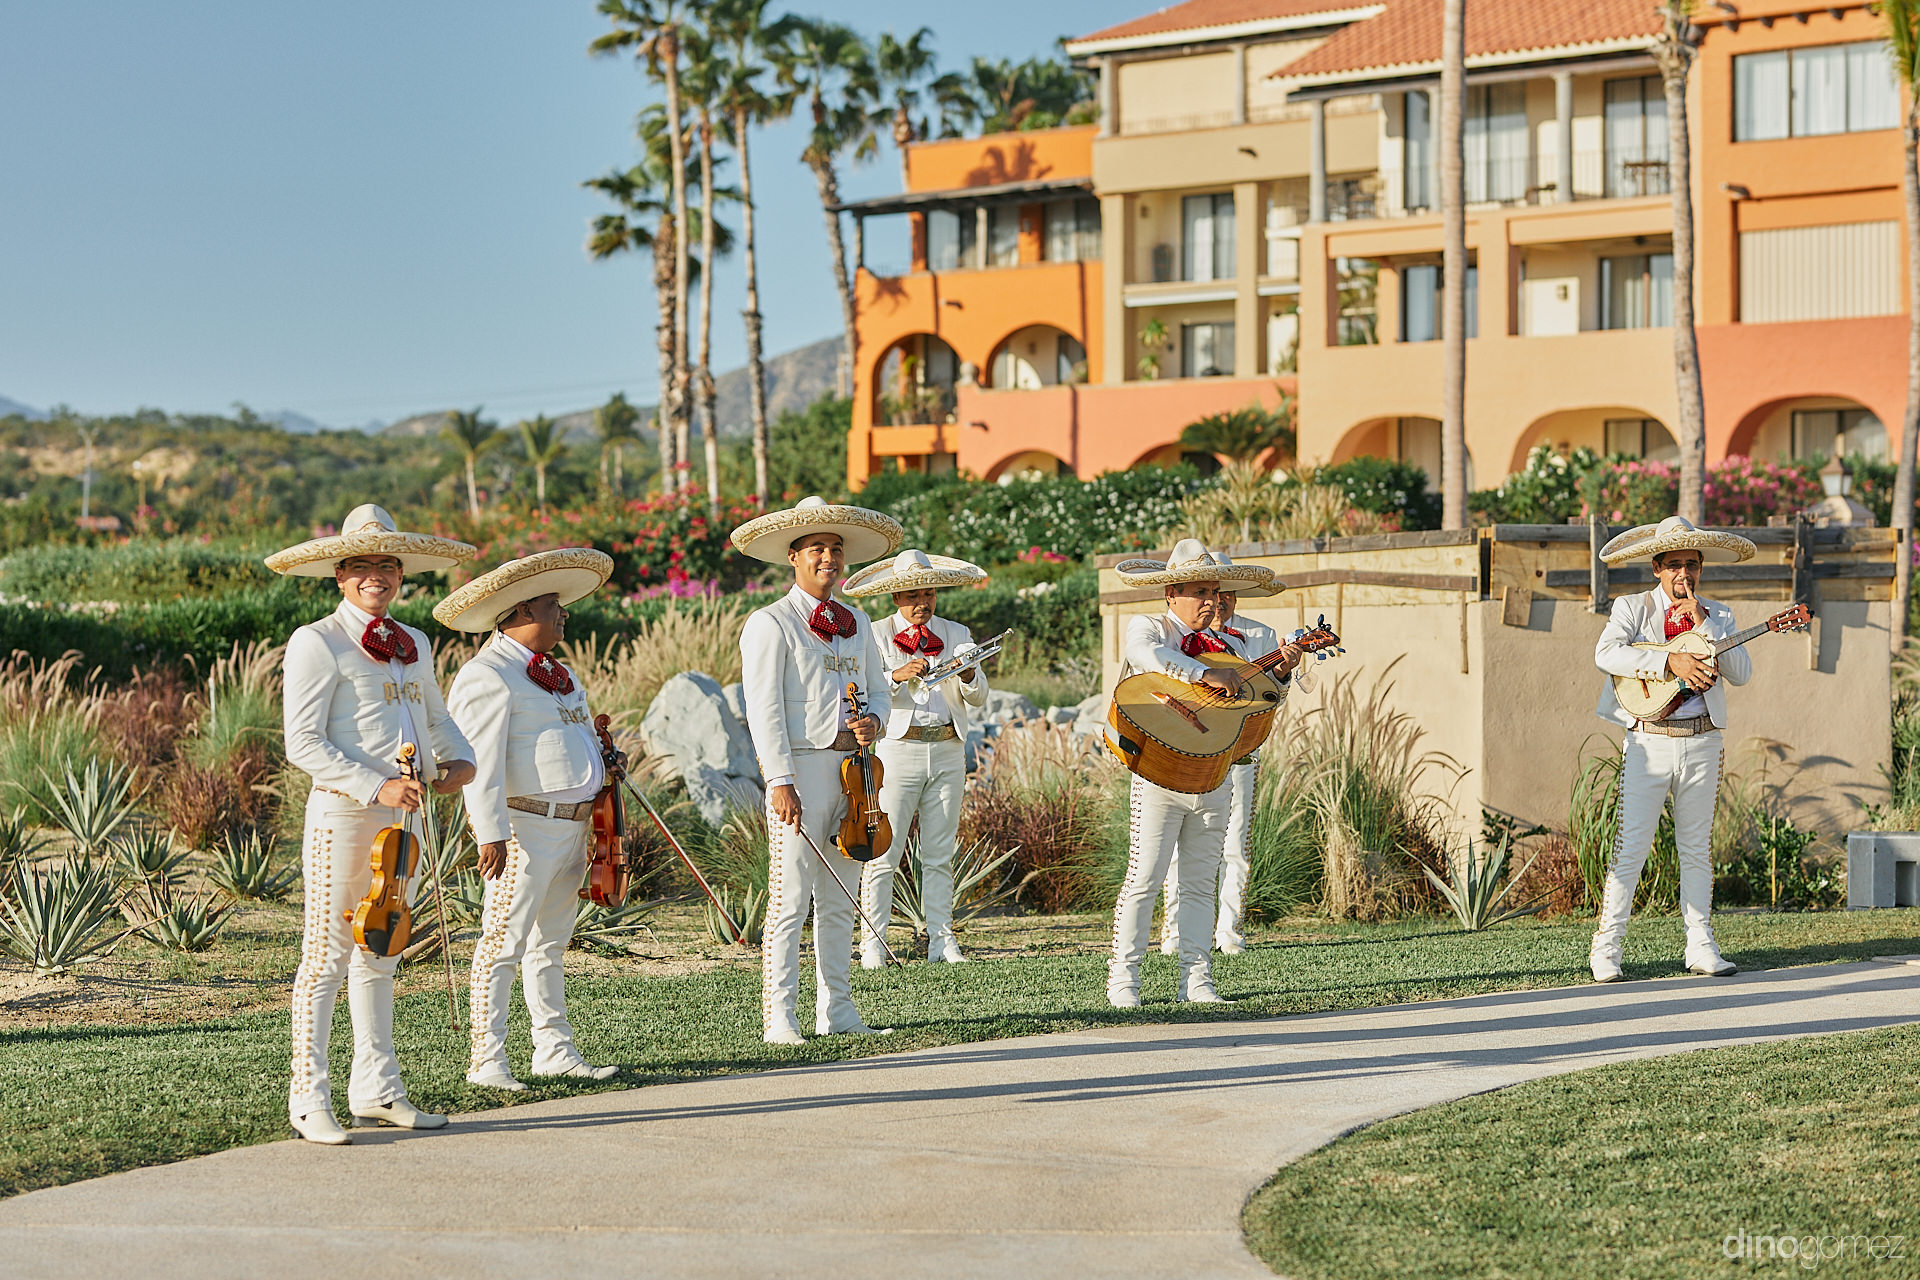 Cabo All Inclusive Wedding - Luxury Wedding Photographer In Cabo Dino Gomez - C&T